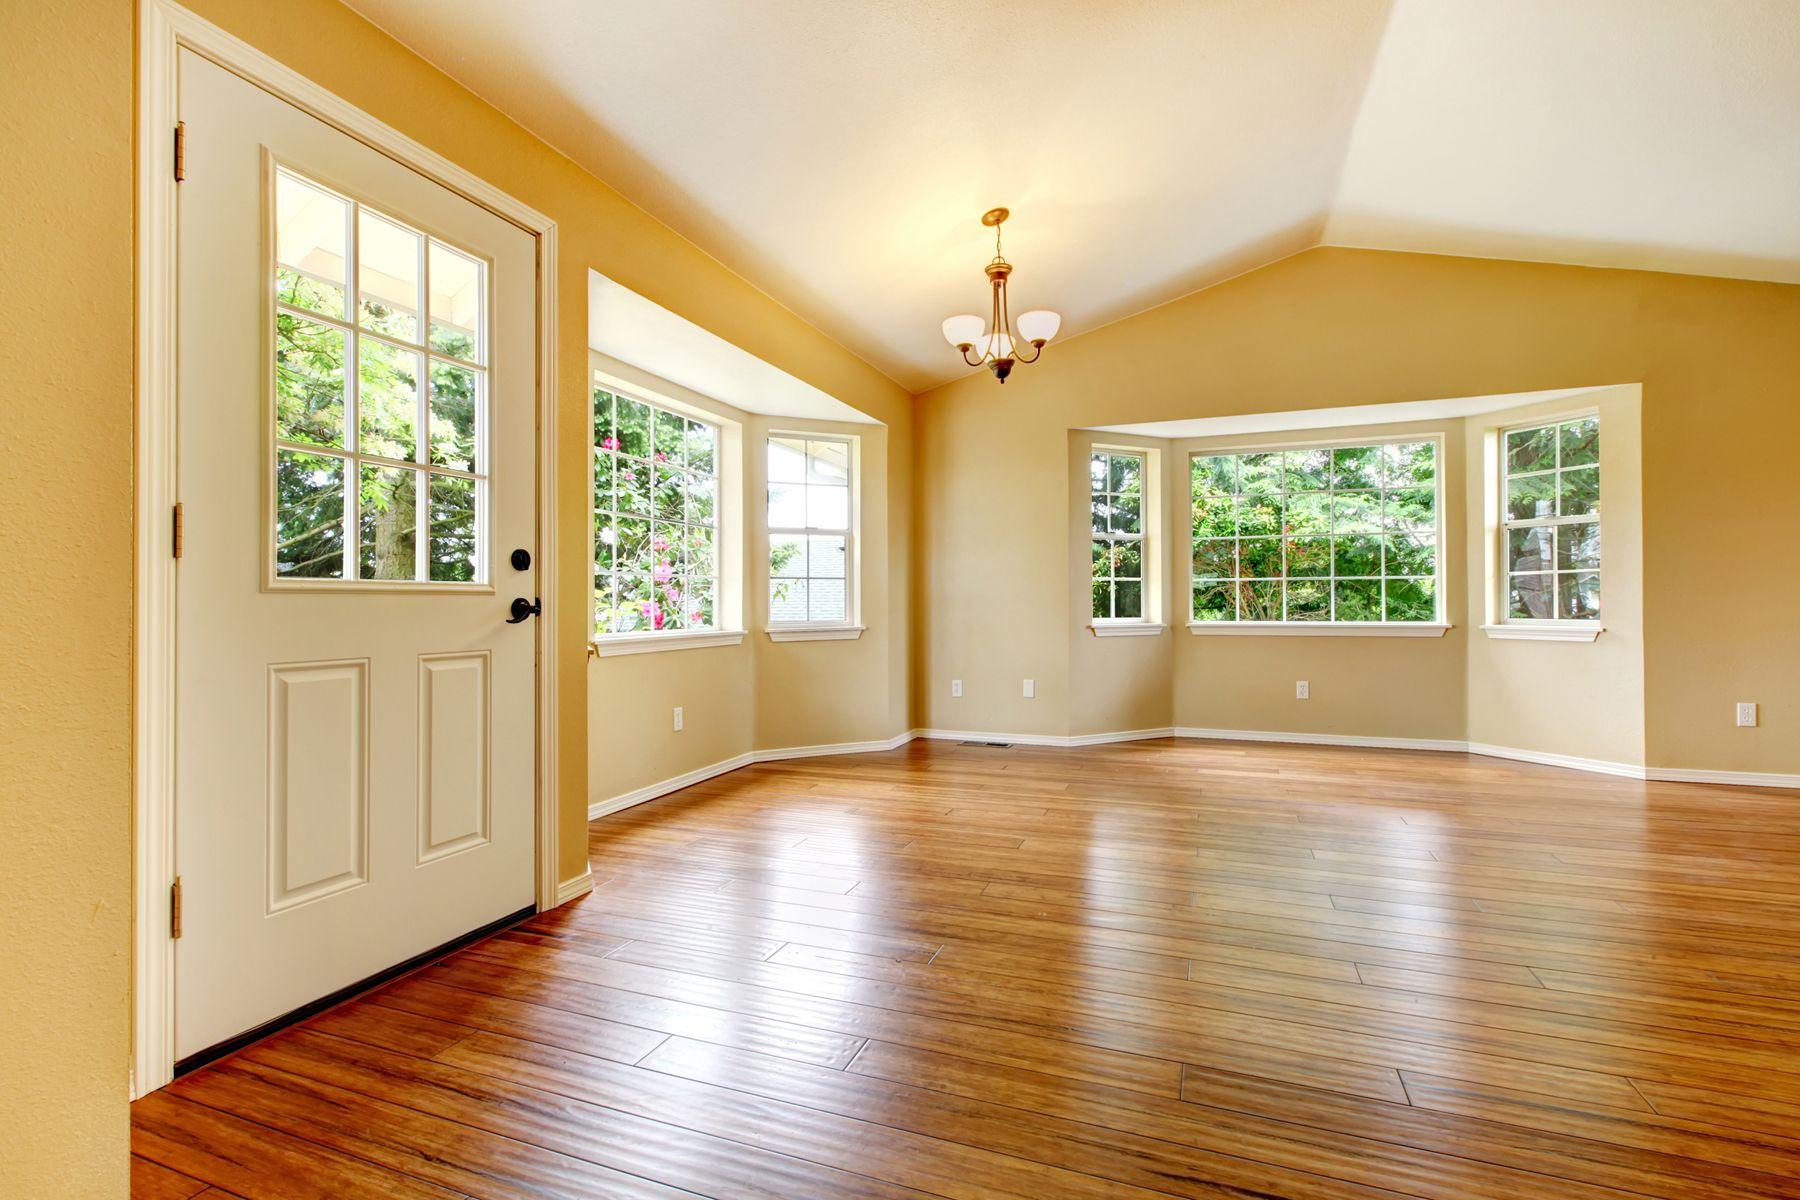 Pin by Pro Atlanta Flooring on Flooring & Projects